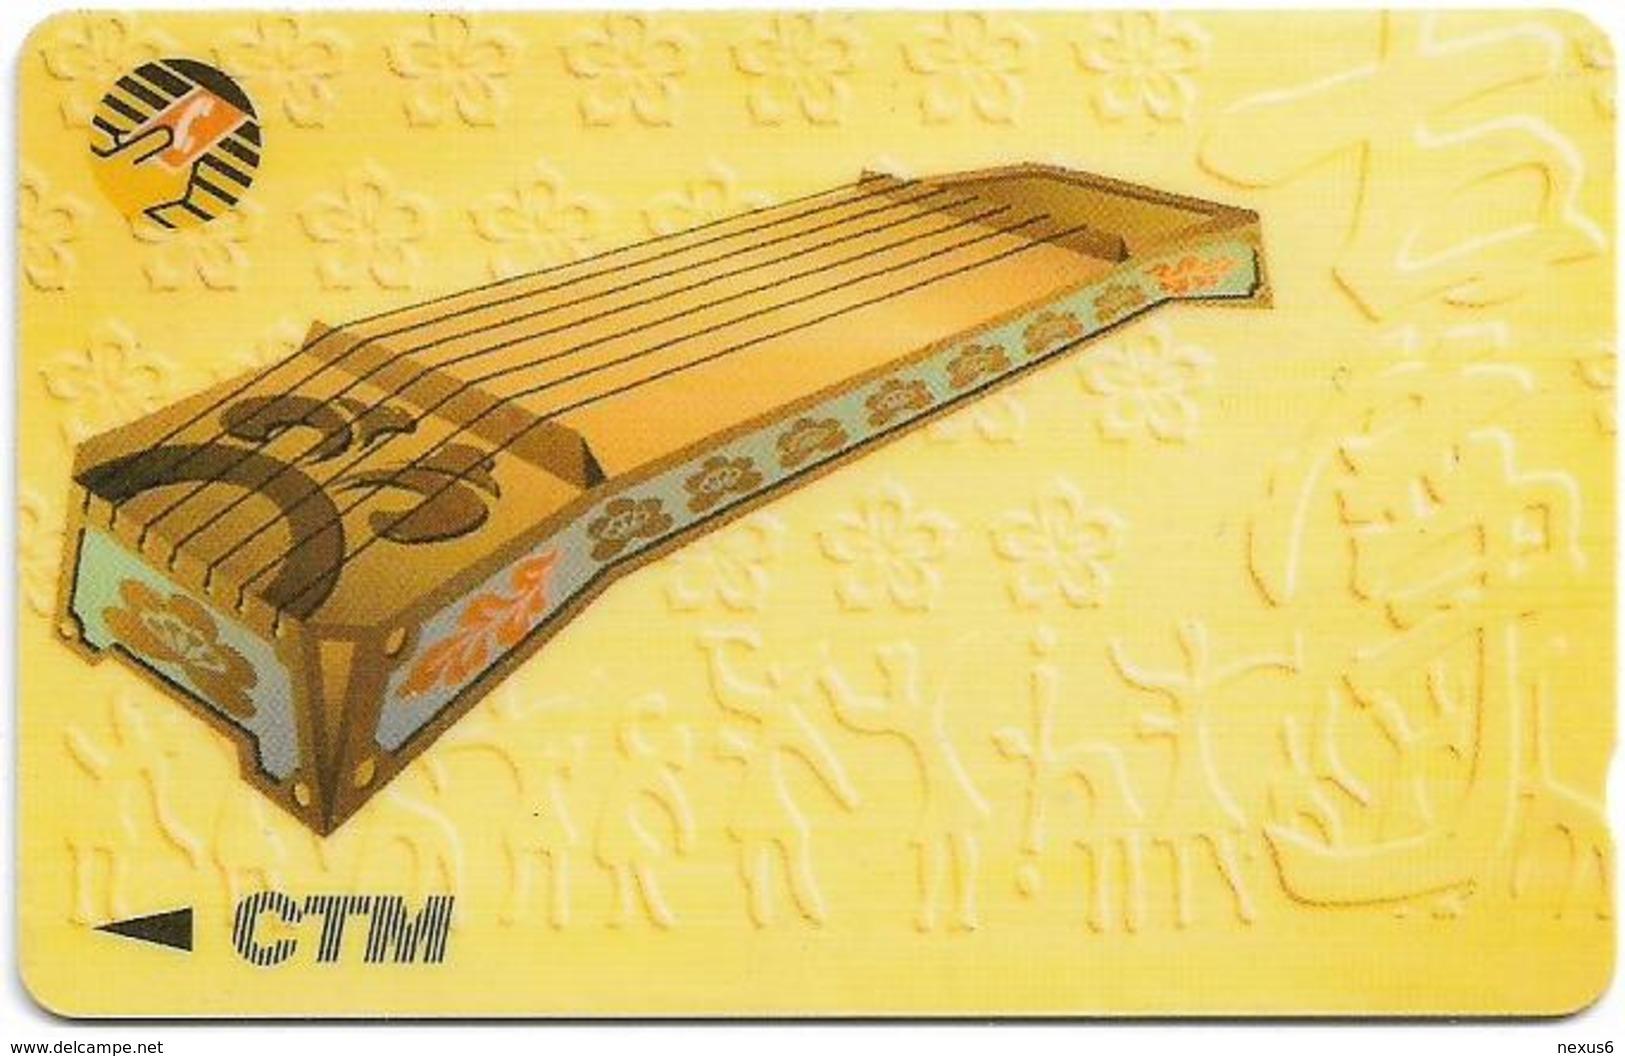 Macau - CTM (GPT) - Pipa Musical Instrument - 1995 - 13MACC - 40.000ex, Used - Macao